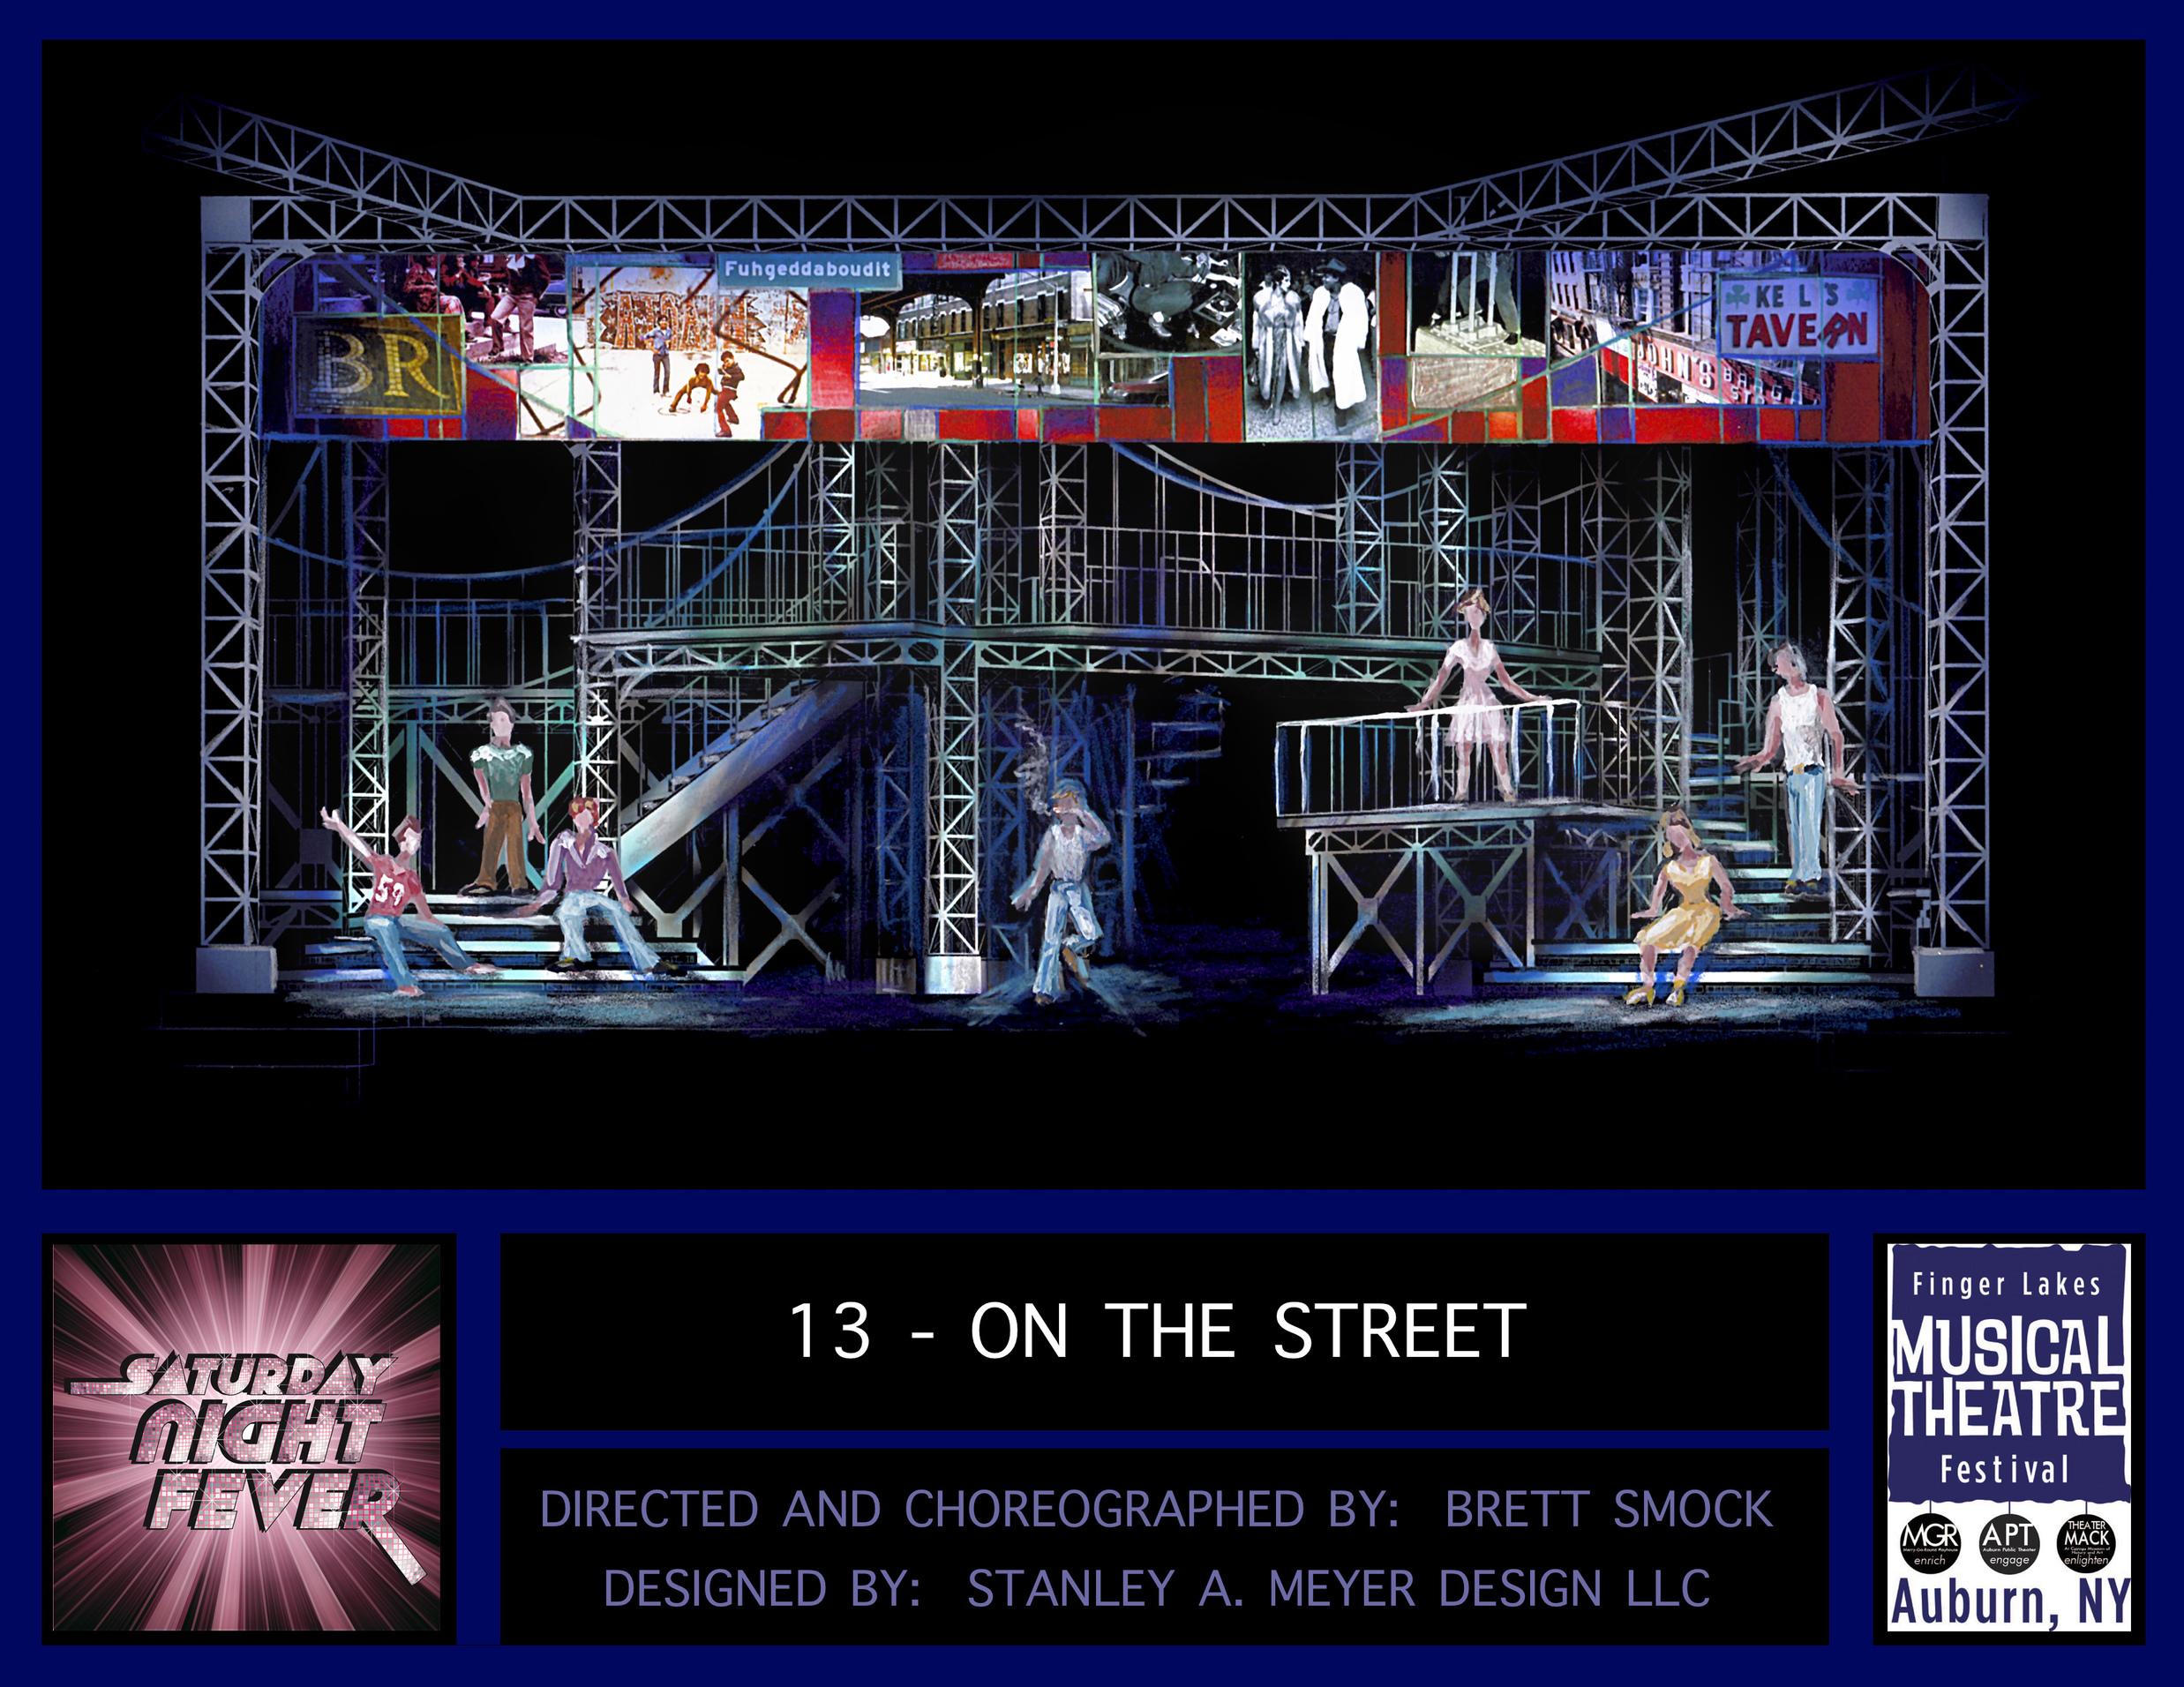 snf-13-on_the_street.jpg